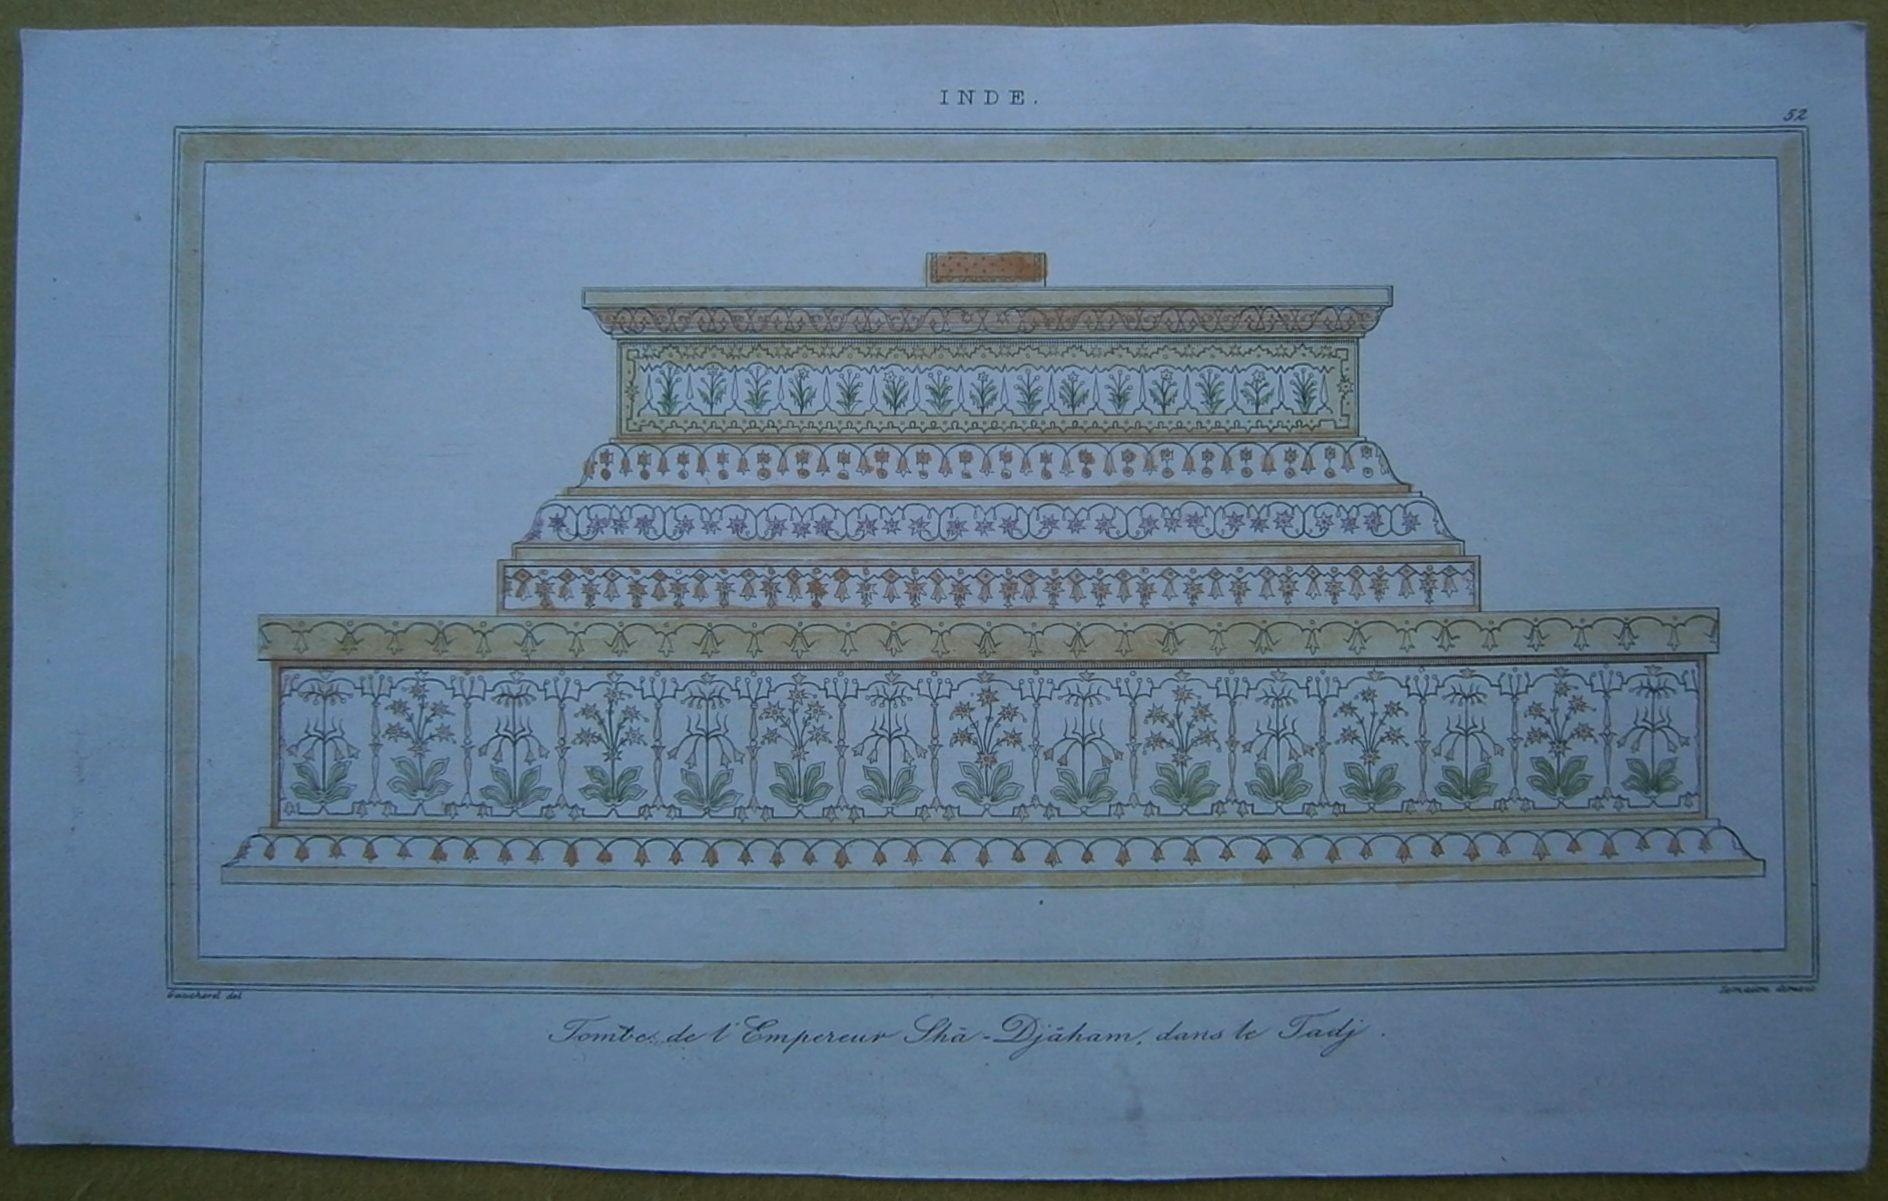 PAINTINGS PORTRAIT SHAH JAHAN MUGHAL EMPEROR INDIA ART POSTER PRINT LV3399